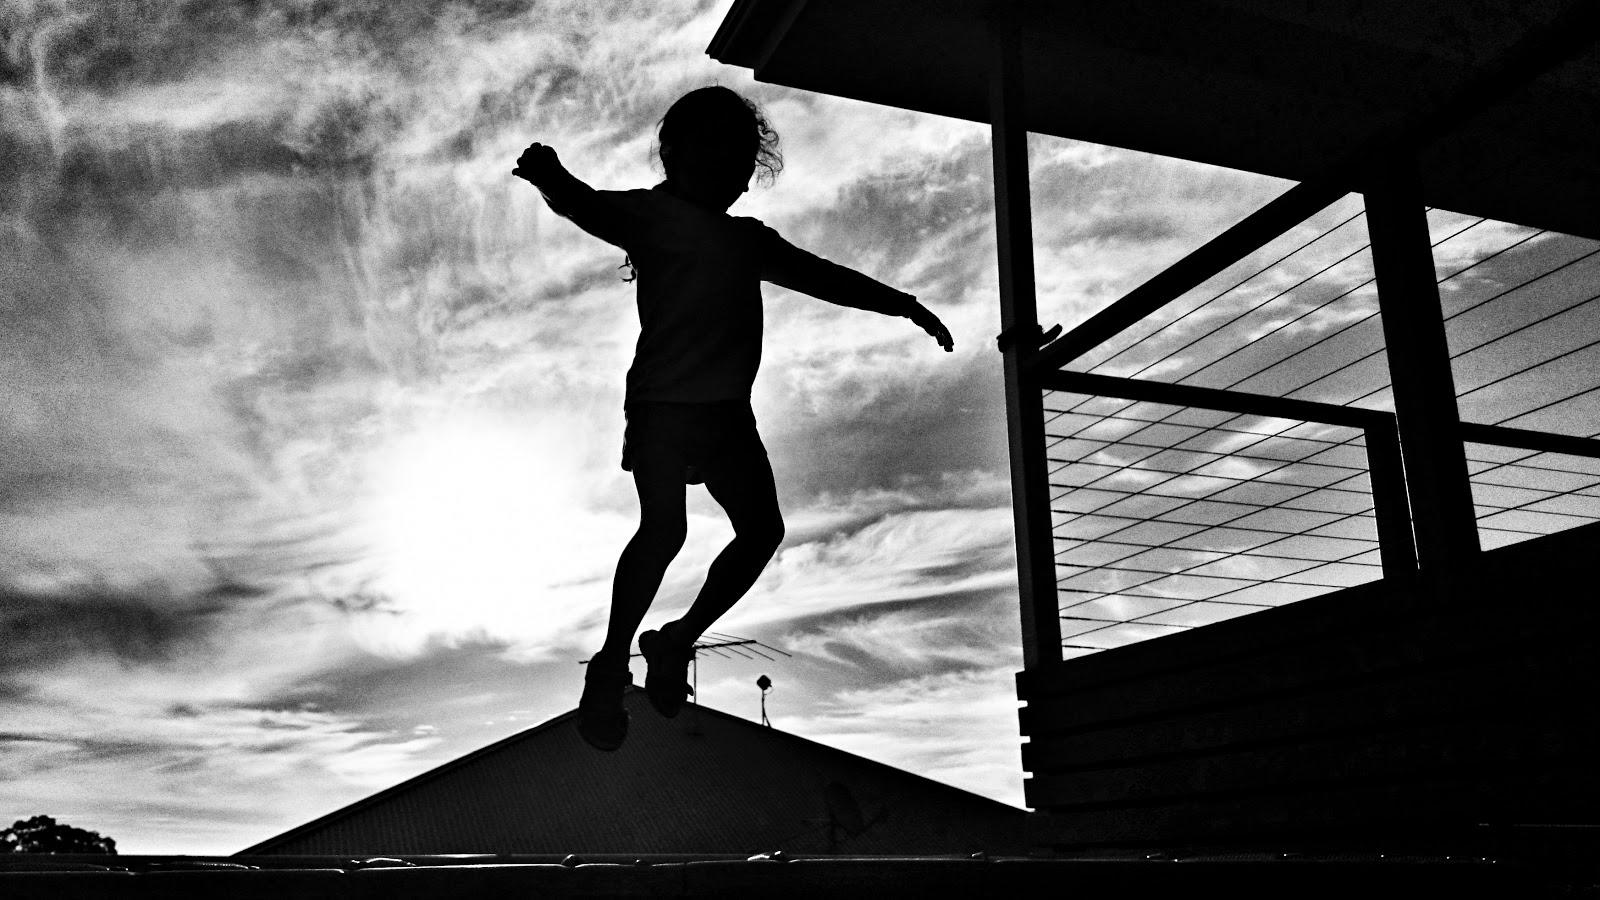 Jump! - Copyright Maria Mastrogiuseppe